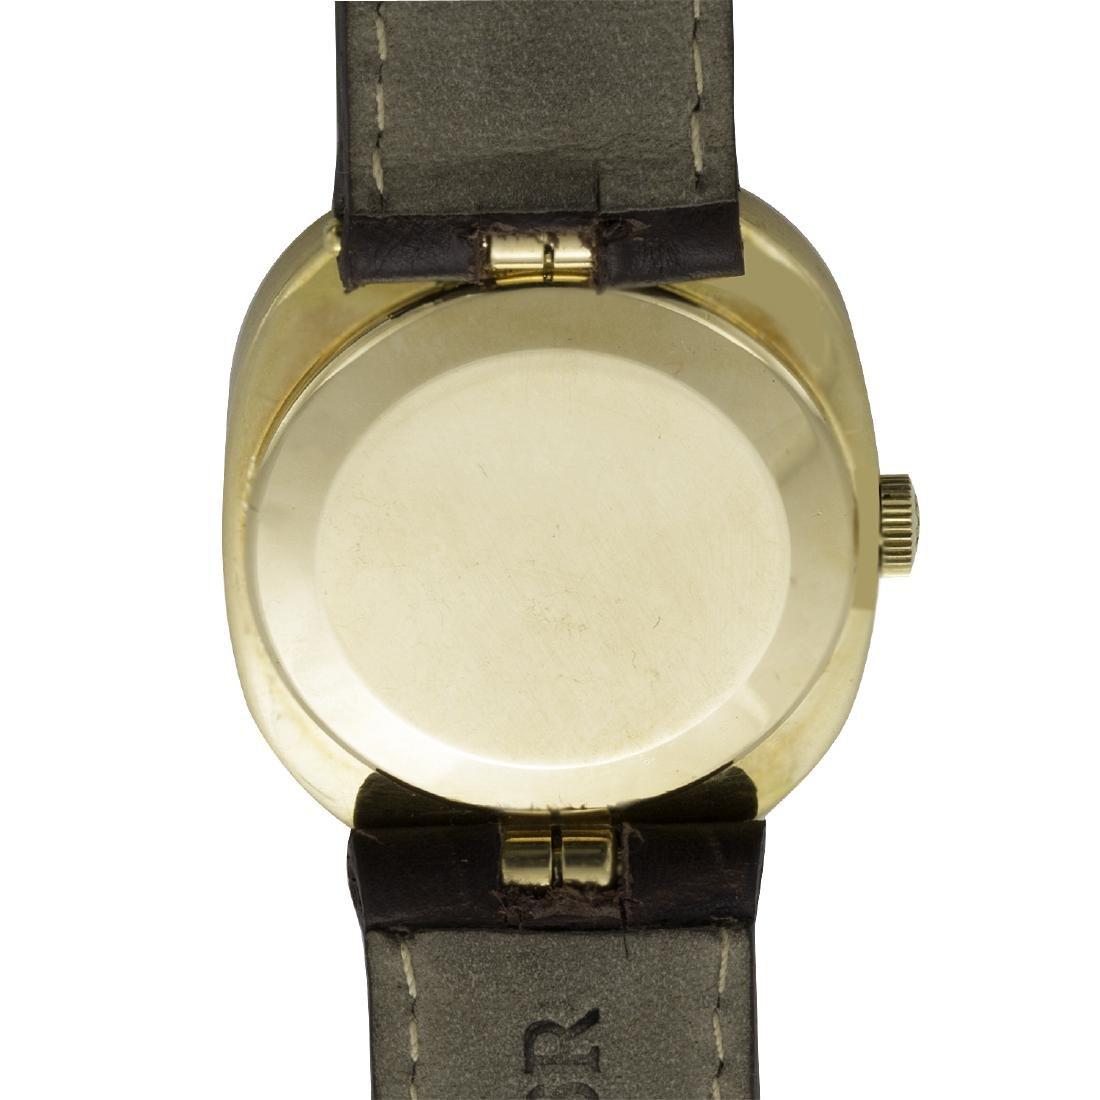 Patek Philippe Ellipse 18K Gold Classic Dress Watch - 3